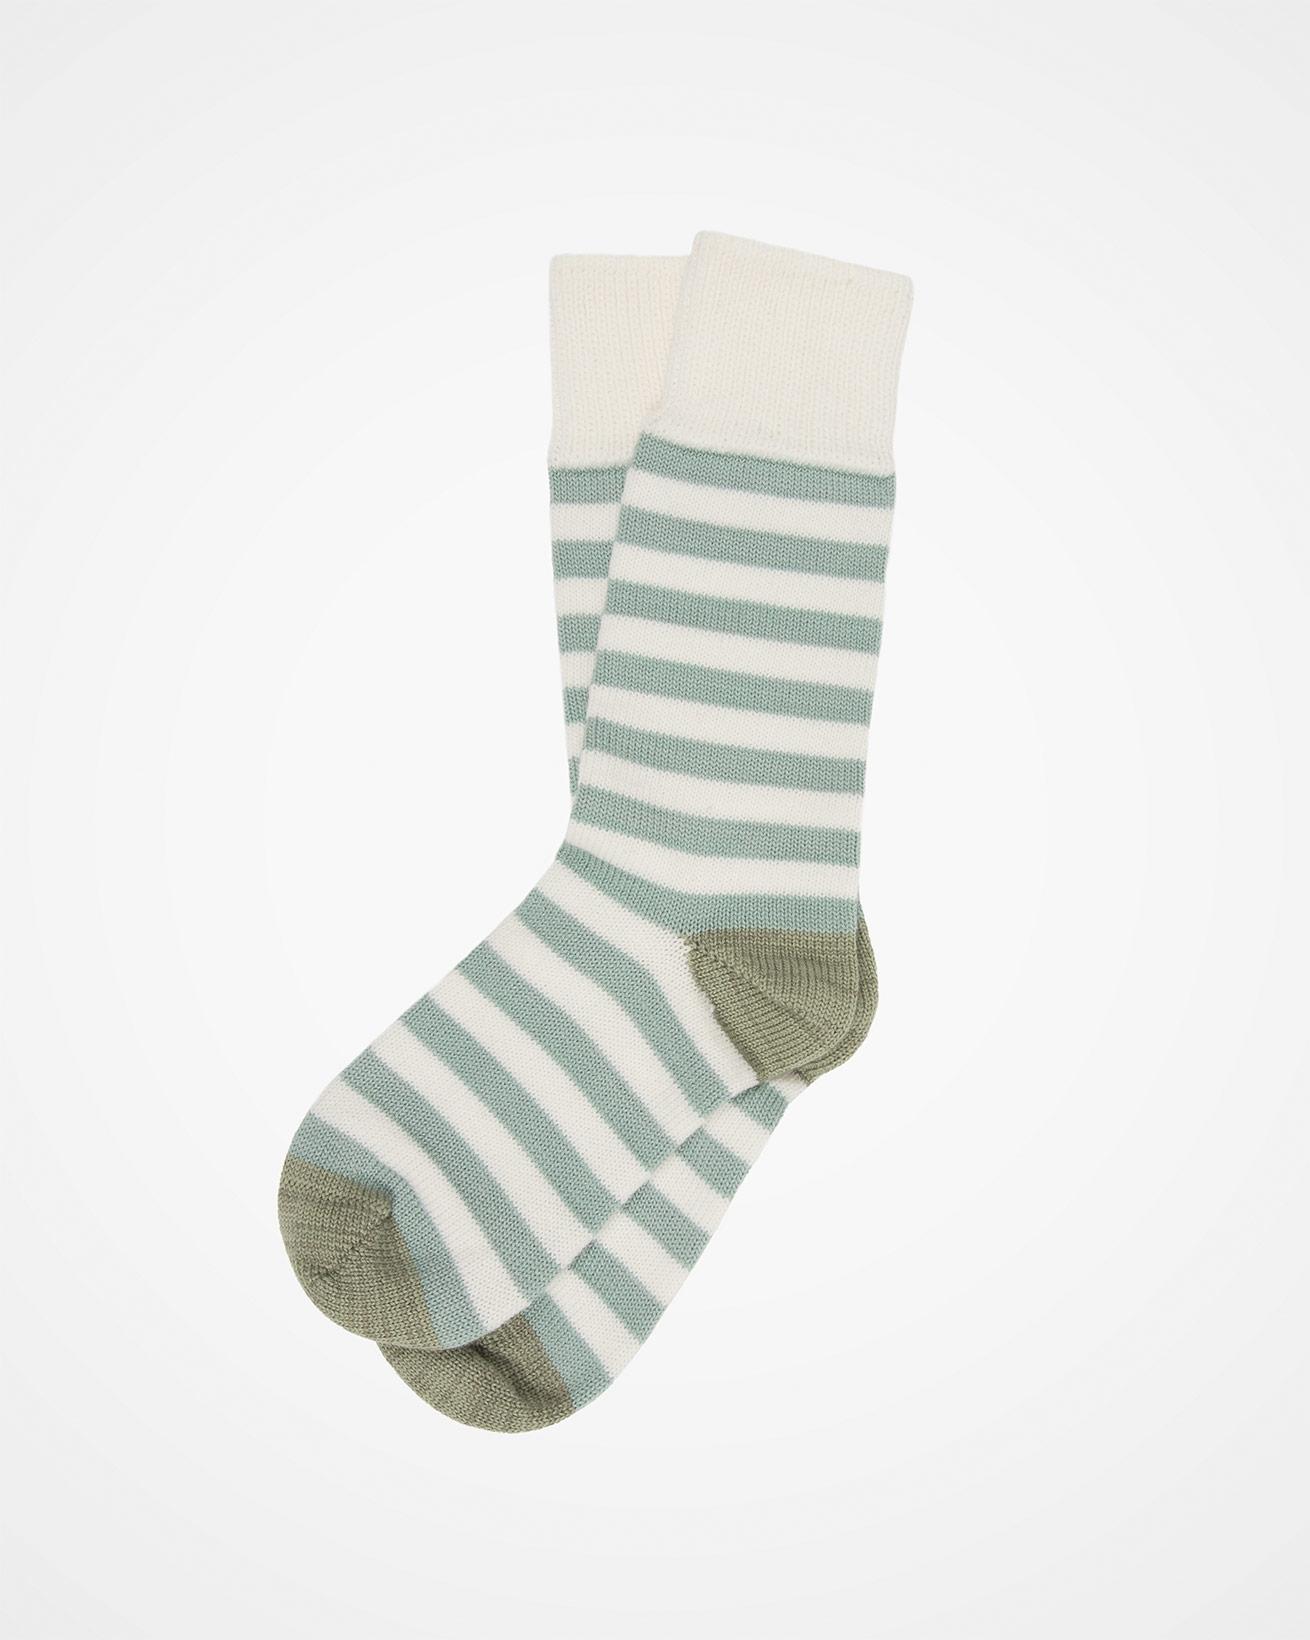 7762_ladies-merino-cotton-stripe-socks_winter-white_flat.jpg